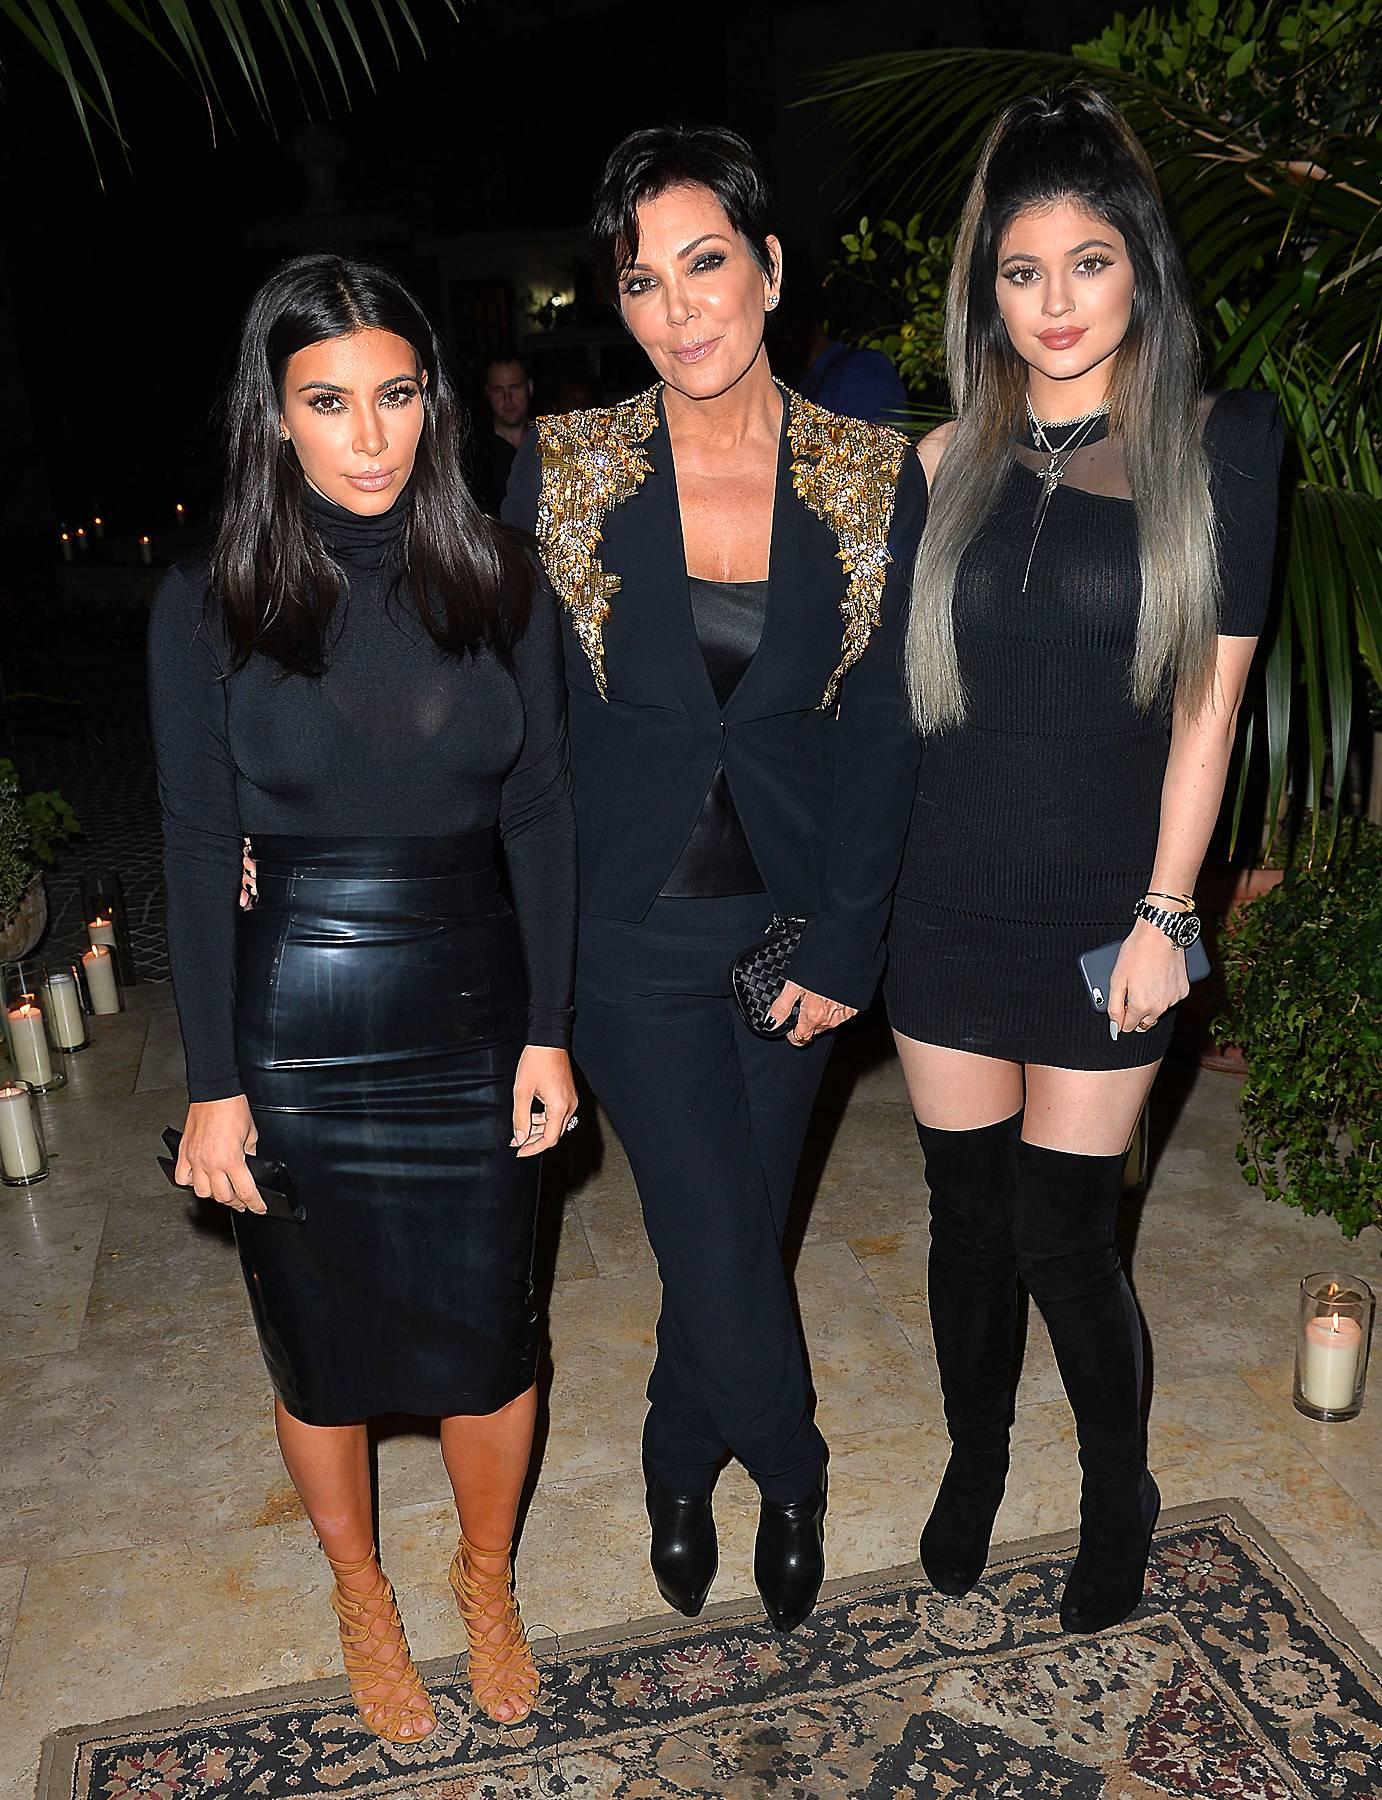 111014-celebs-out-Kim-Kardashian-Kris-Jenner-Kylie-Jenner.jpg